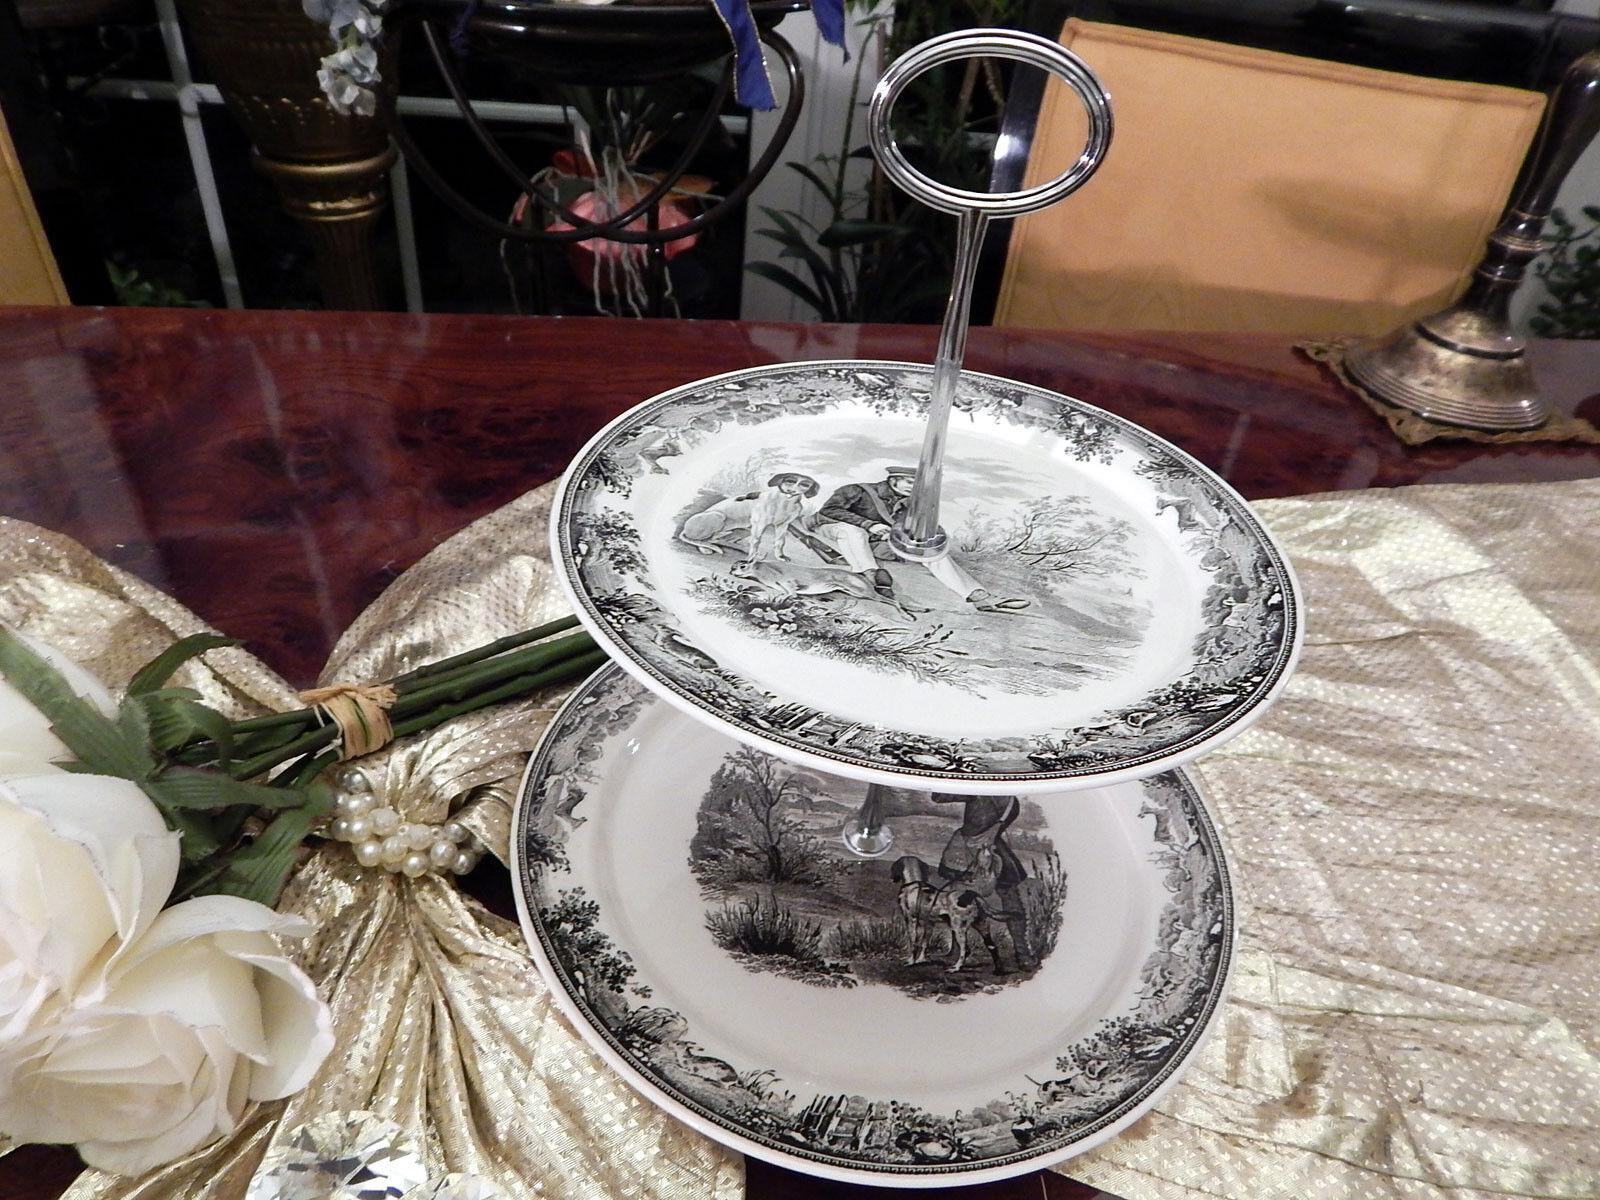 Edle große Etagere Etagere Etagere 2-stufig Villeroy & Boch Artemis | Für Ihre Wahl  c0666b